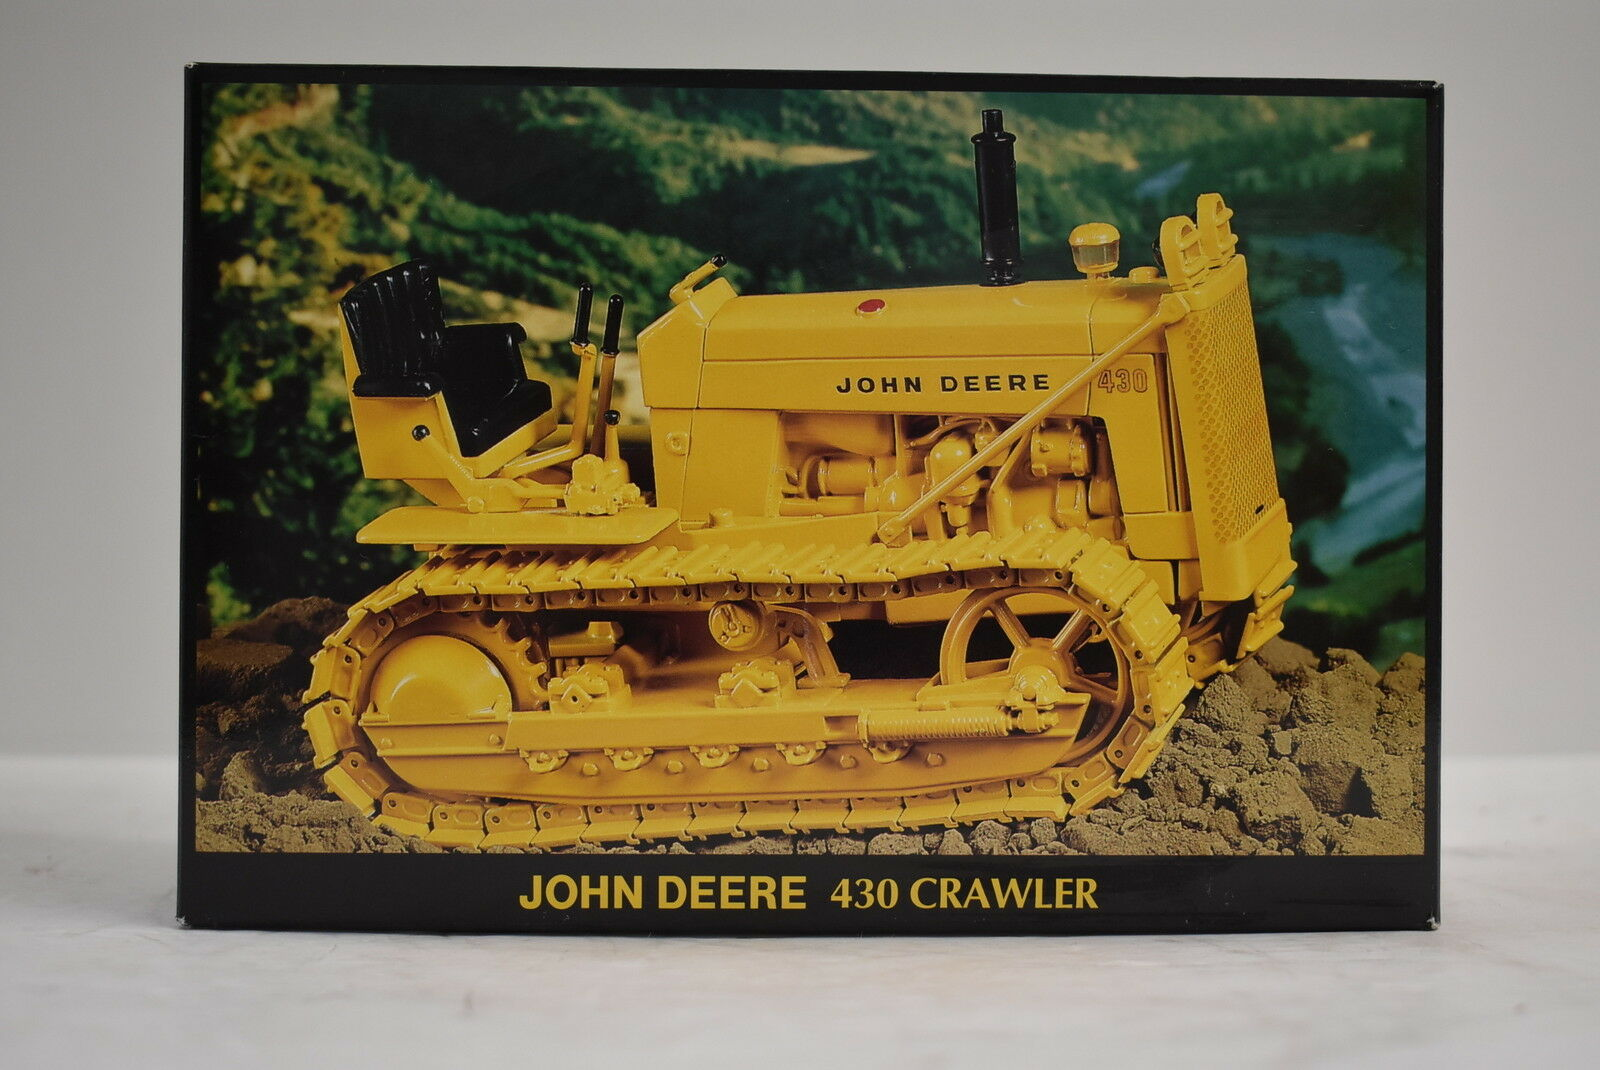 1 16 John Deere 430 Crawler New in Box by Ertl industrial yellow